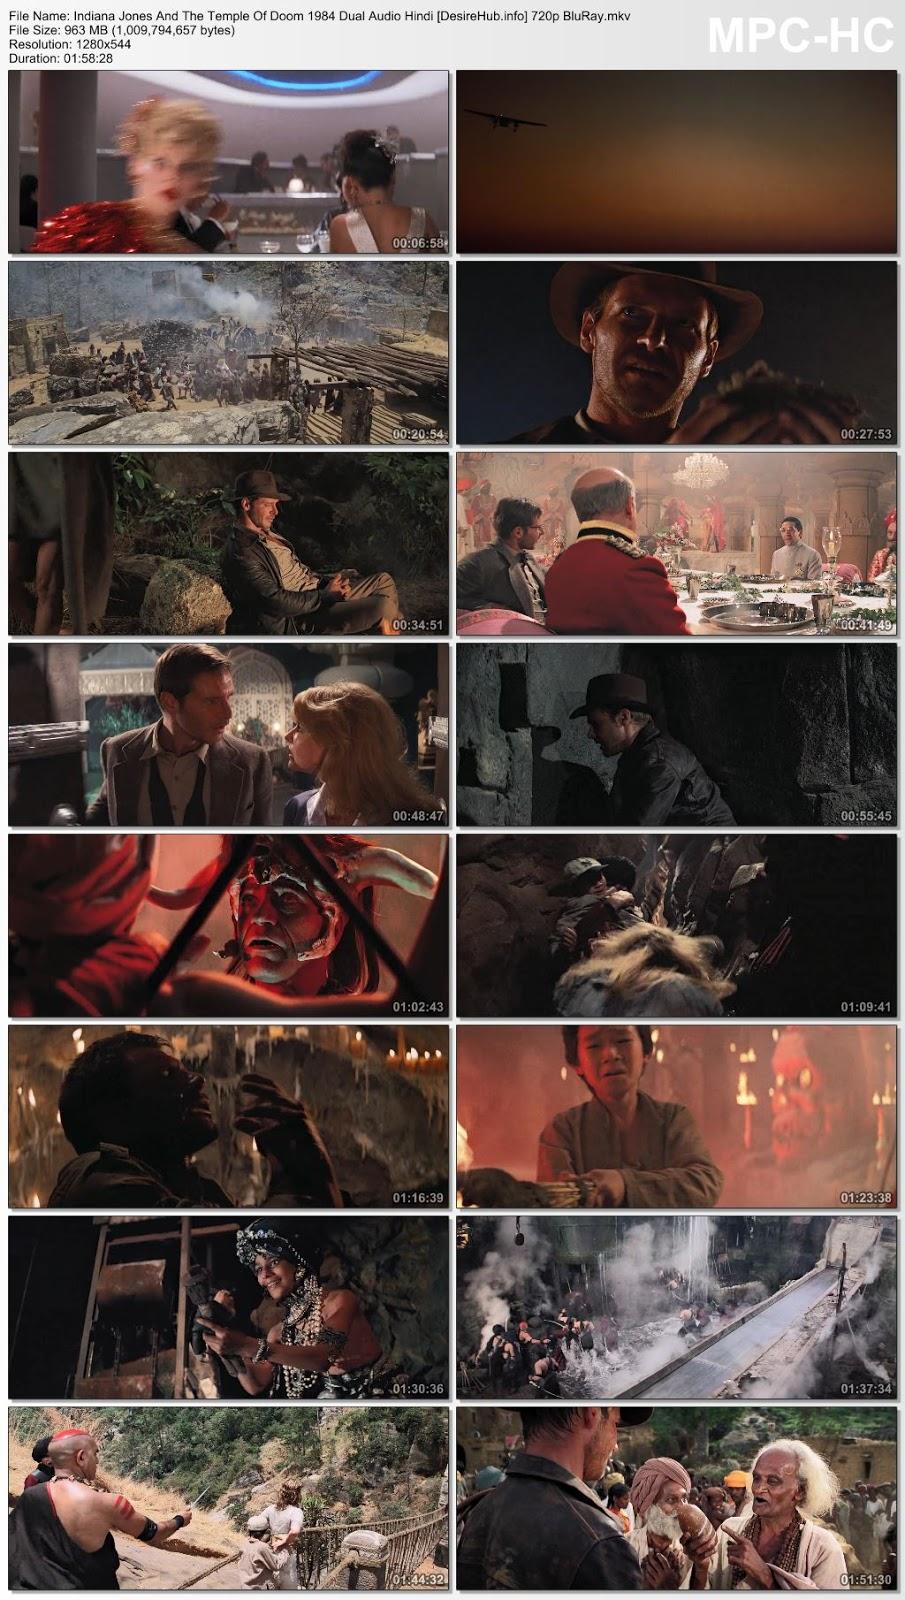 Indiana Jones And The Temple Of Doom 1984 Dual Audio Hindi 720p BluRay 950MB Desirehub